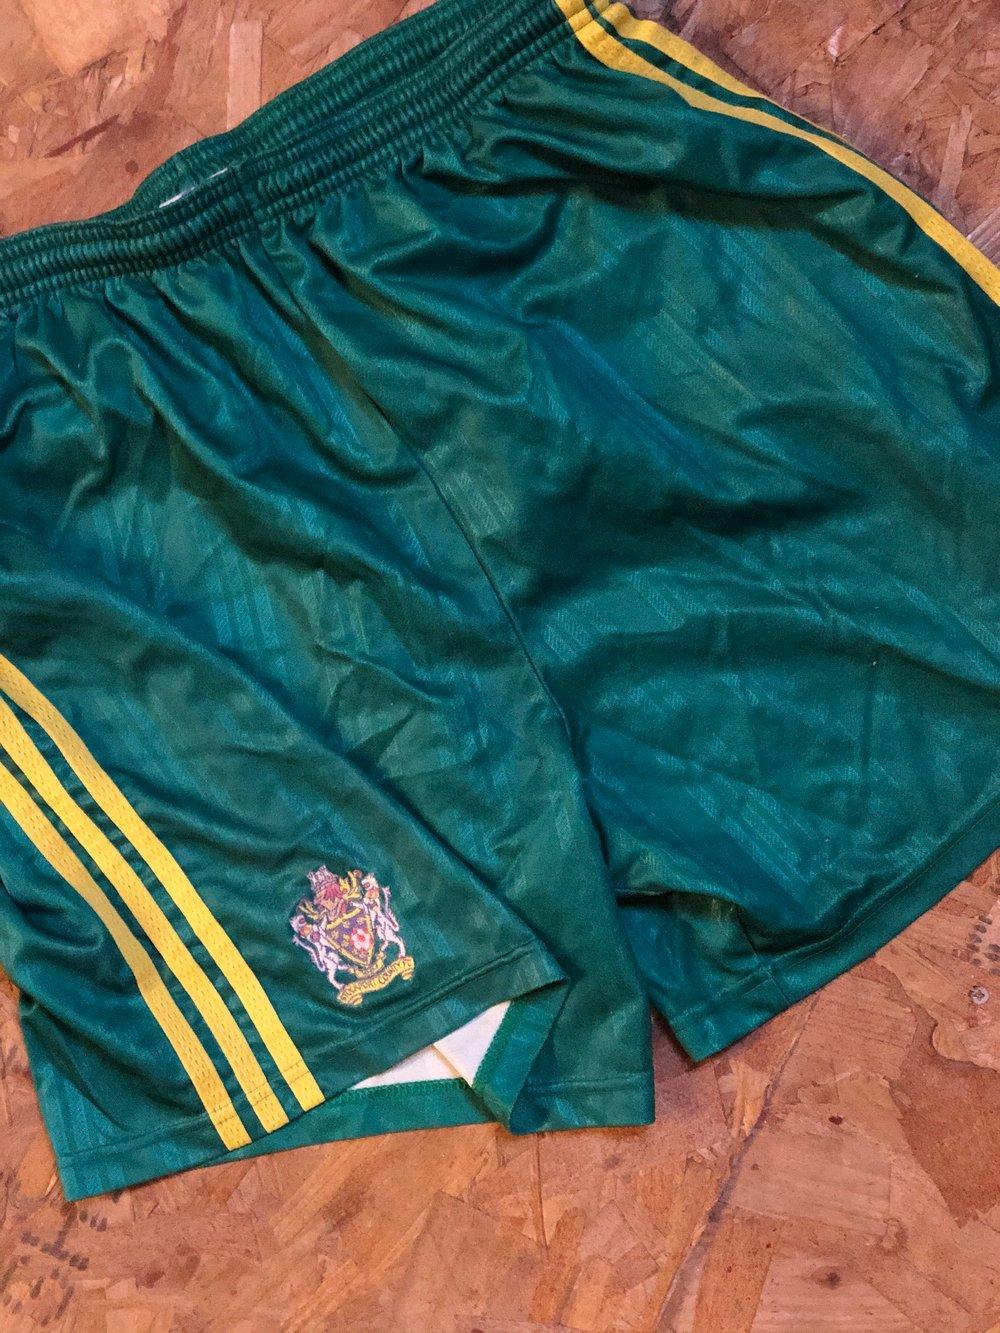 Match Worn 1998/99 adidas Away Shorts